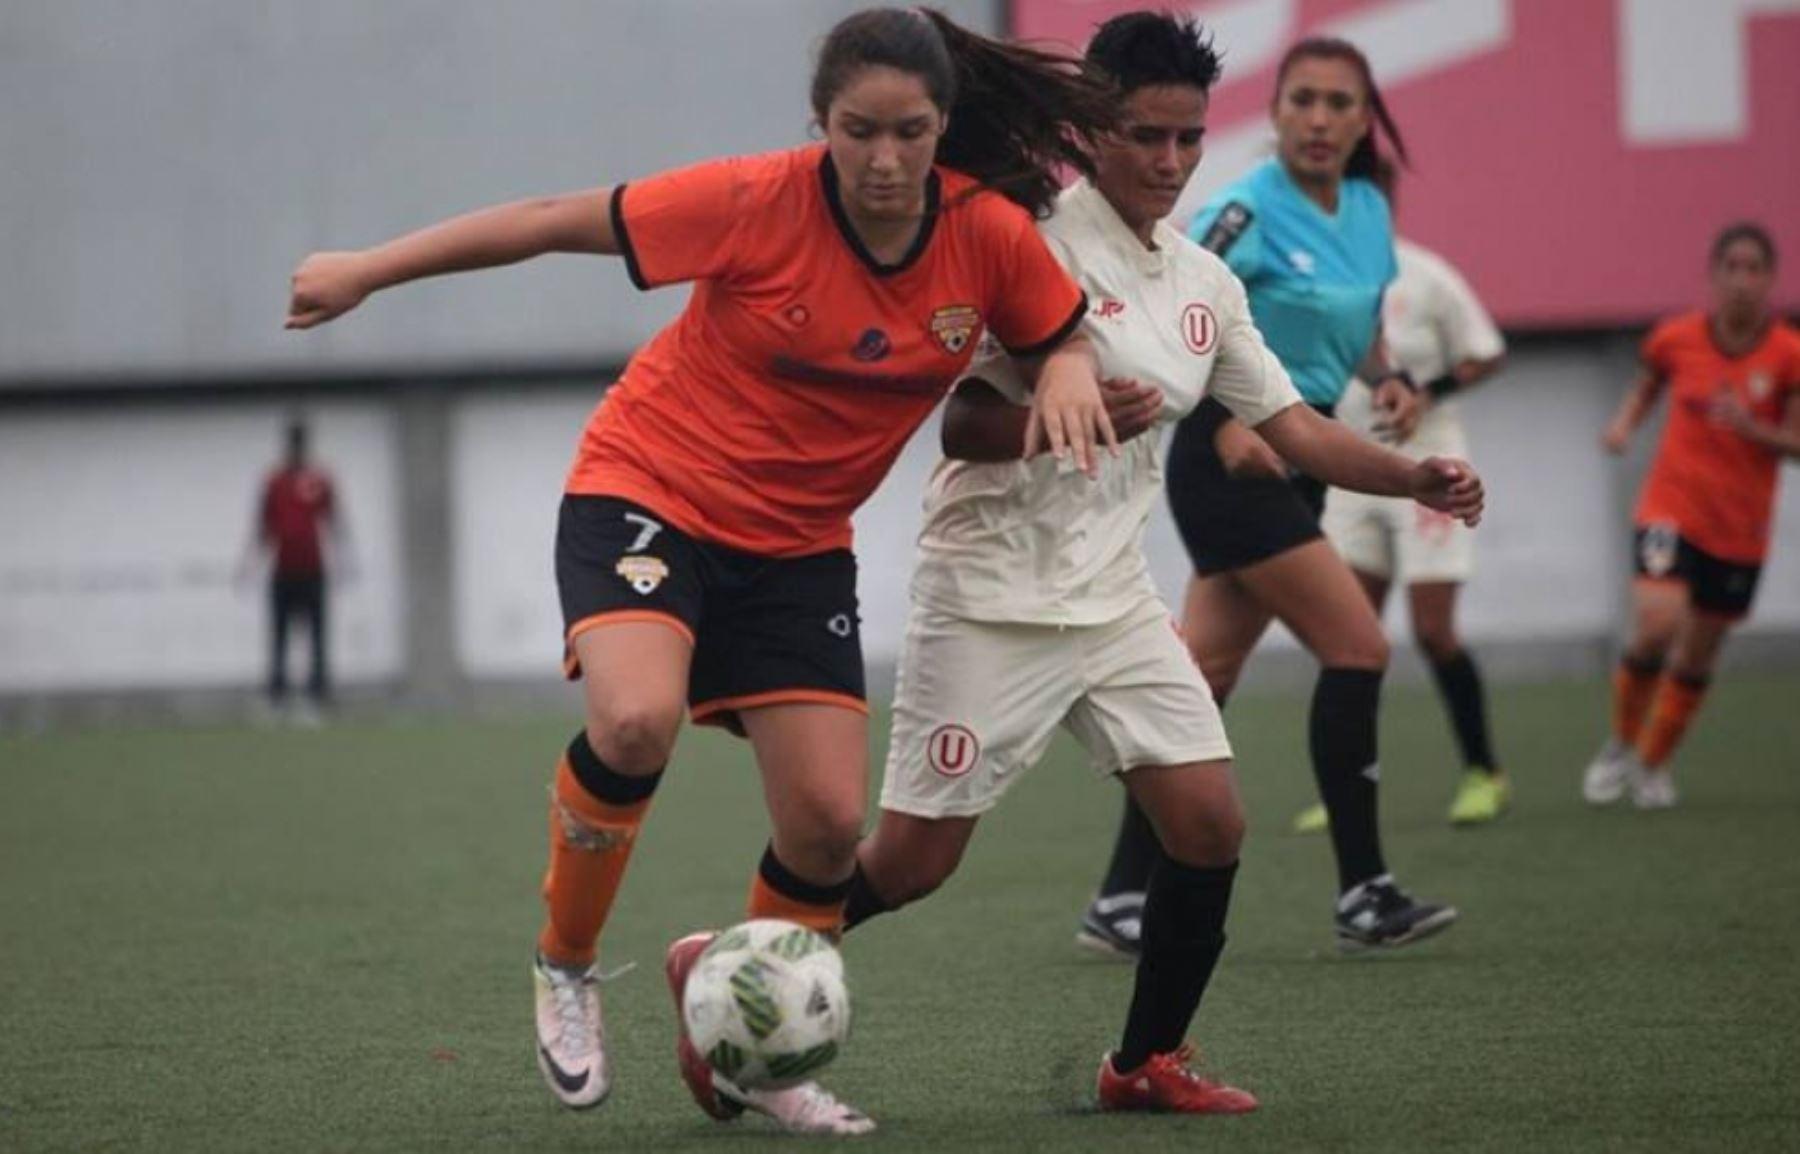 Campeonato Nacional de Fútbol Femenino.